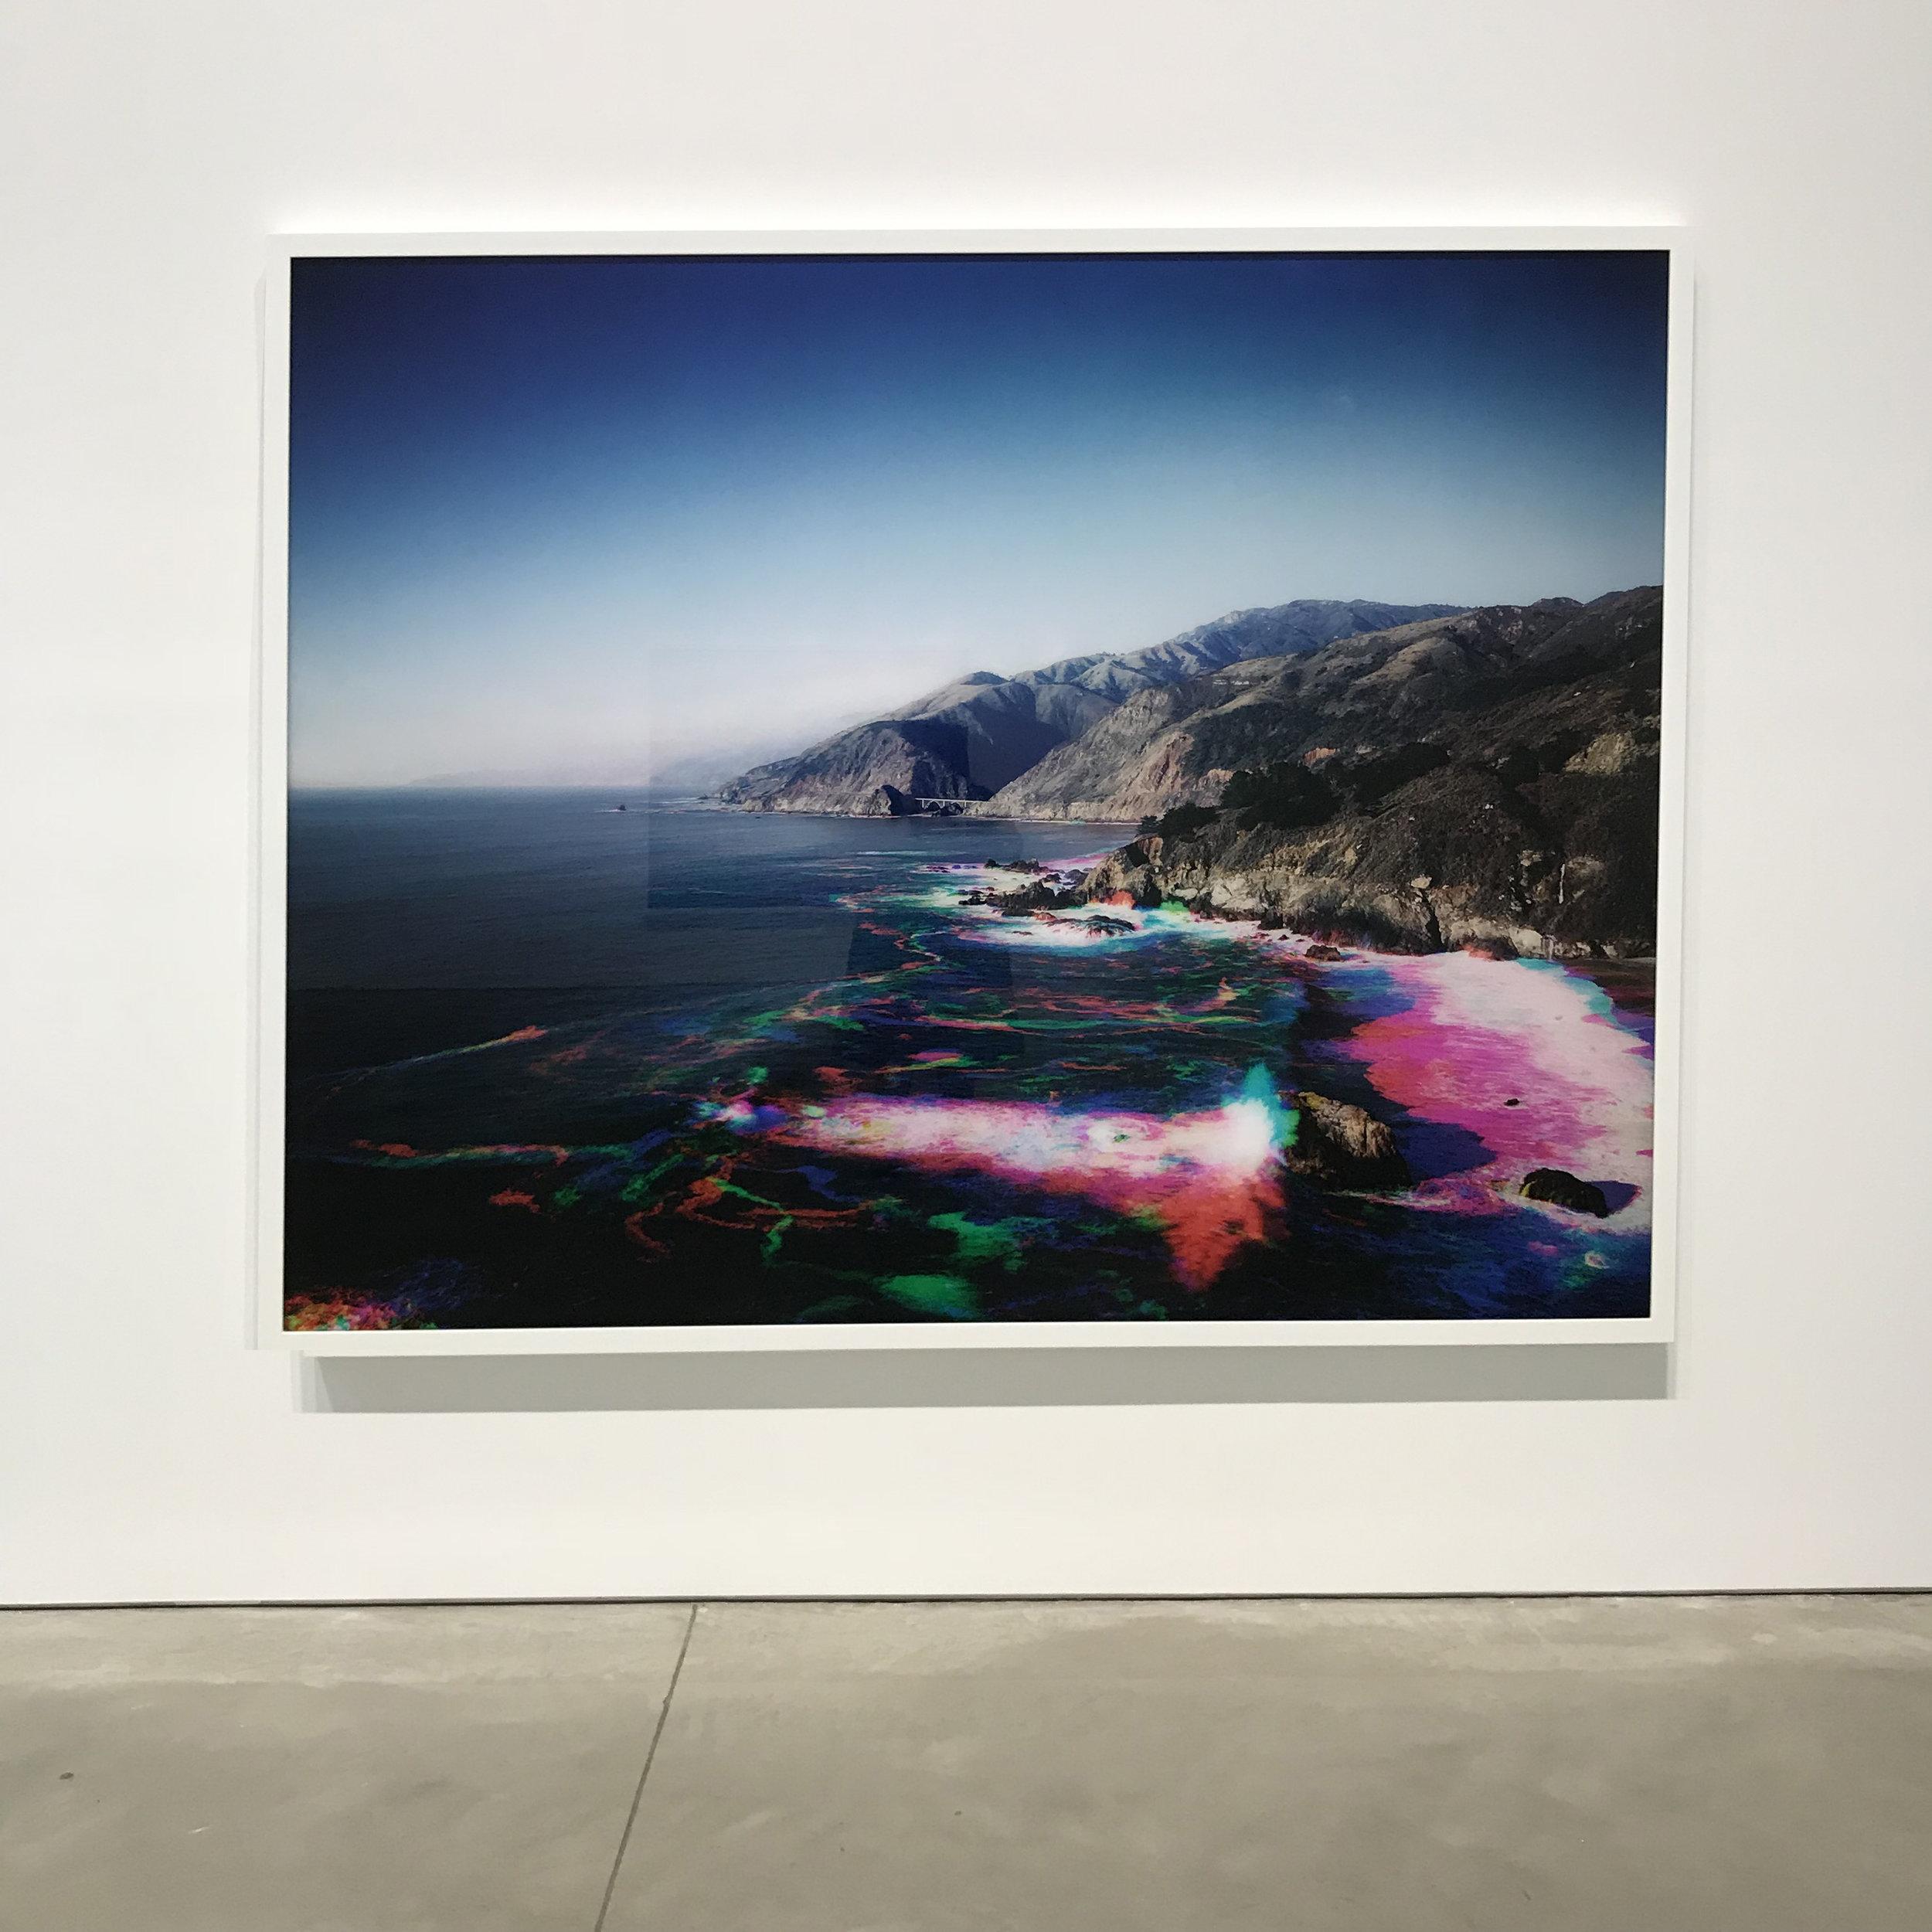 Florian Maier-Aichen at 303 Gallery